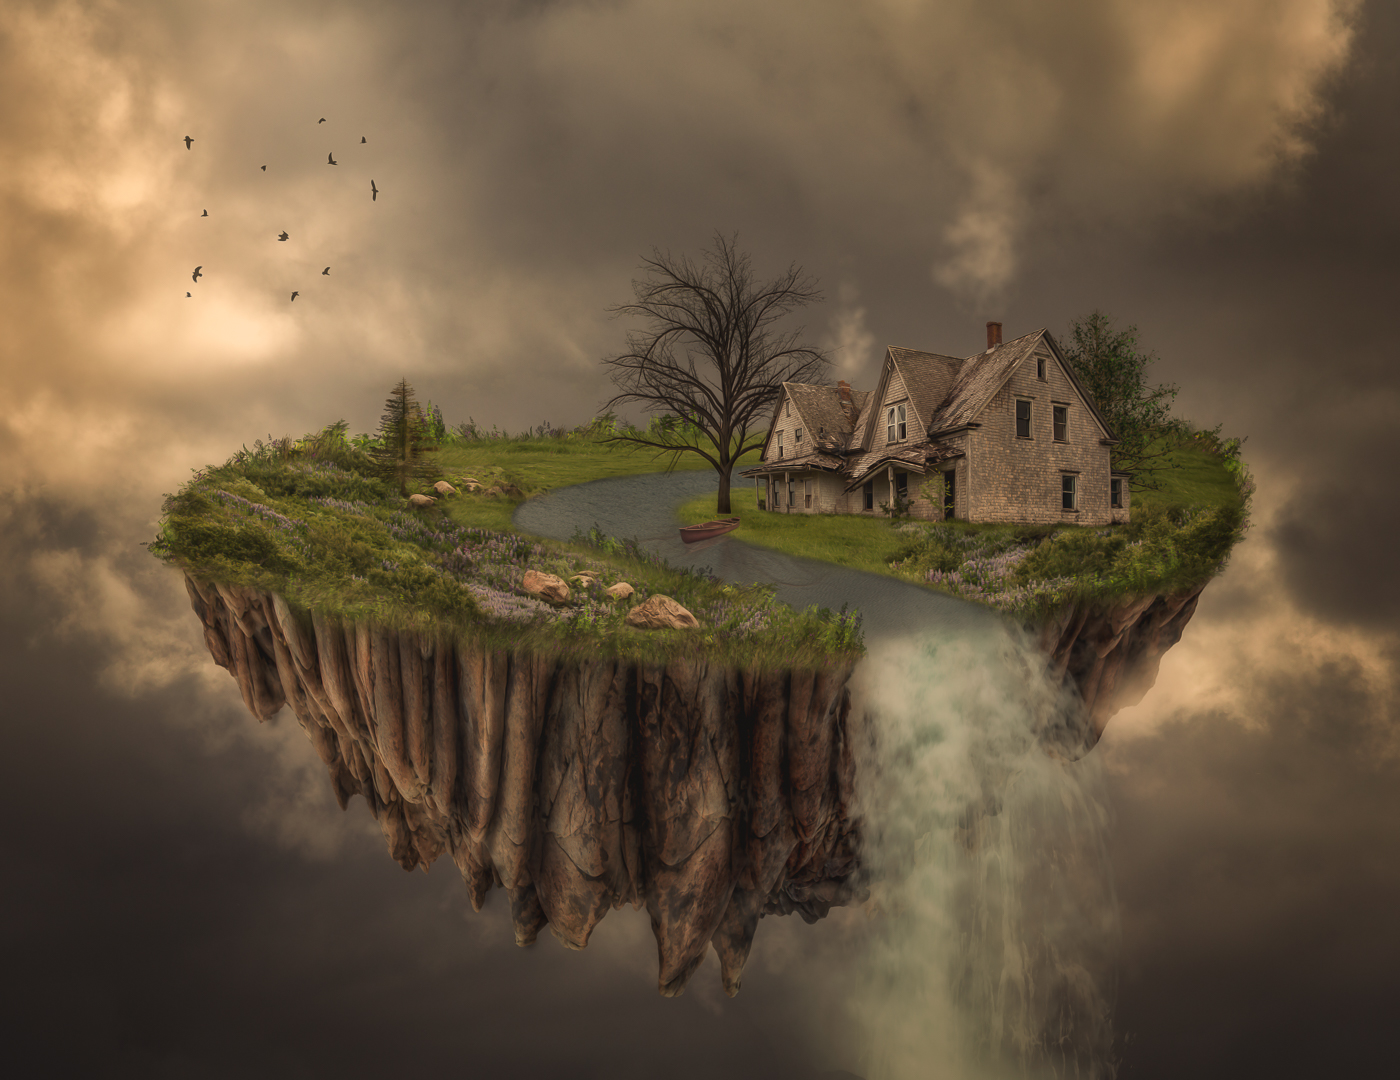 Where Dreams Live by Michele McCain